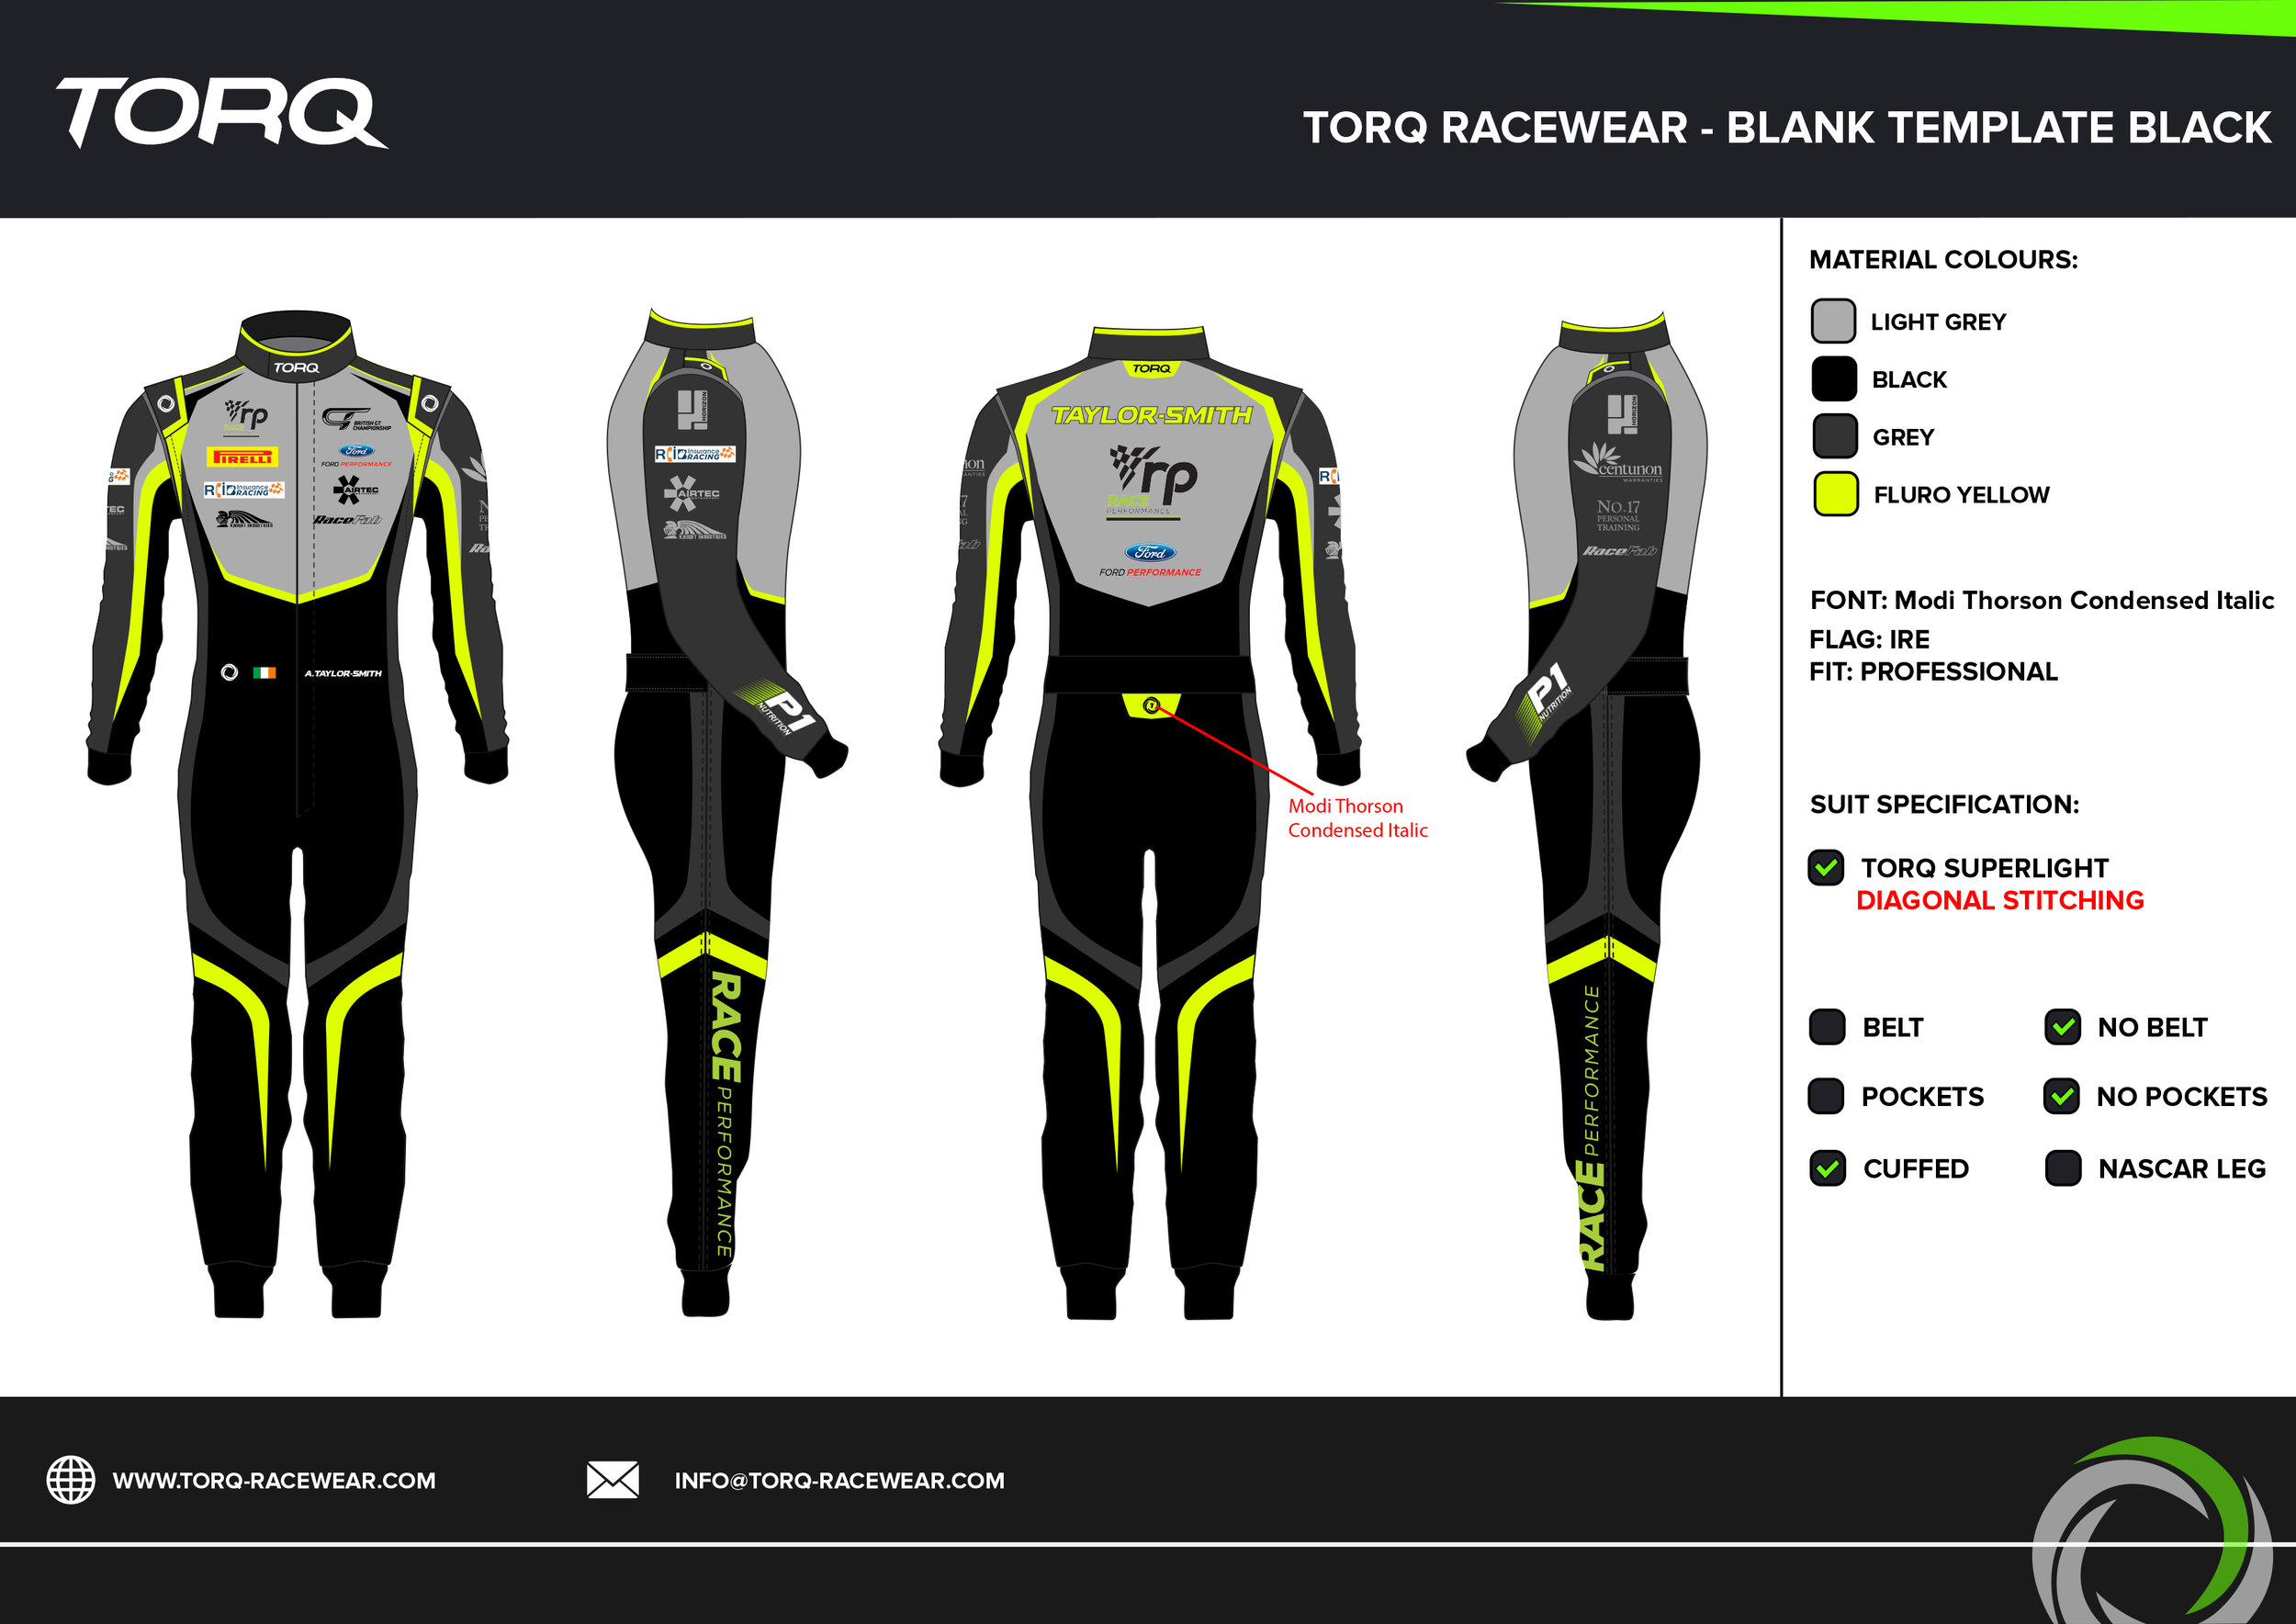 TSL-RACE-P-TAYLOR-SMITH.jpg